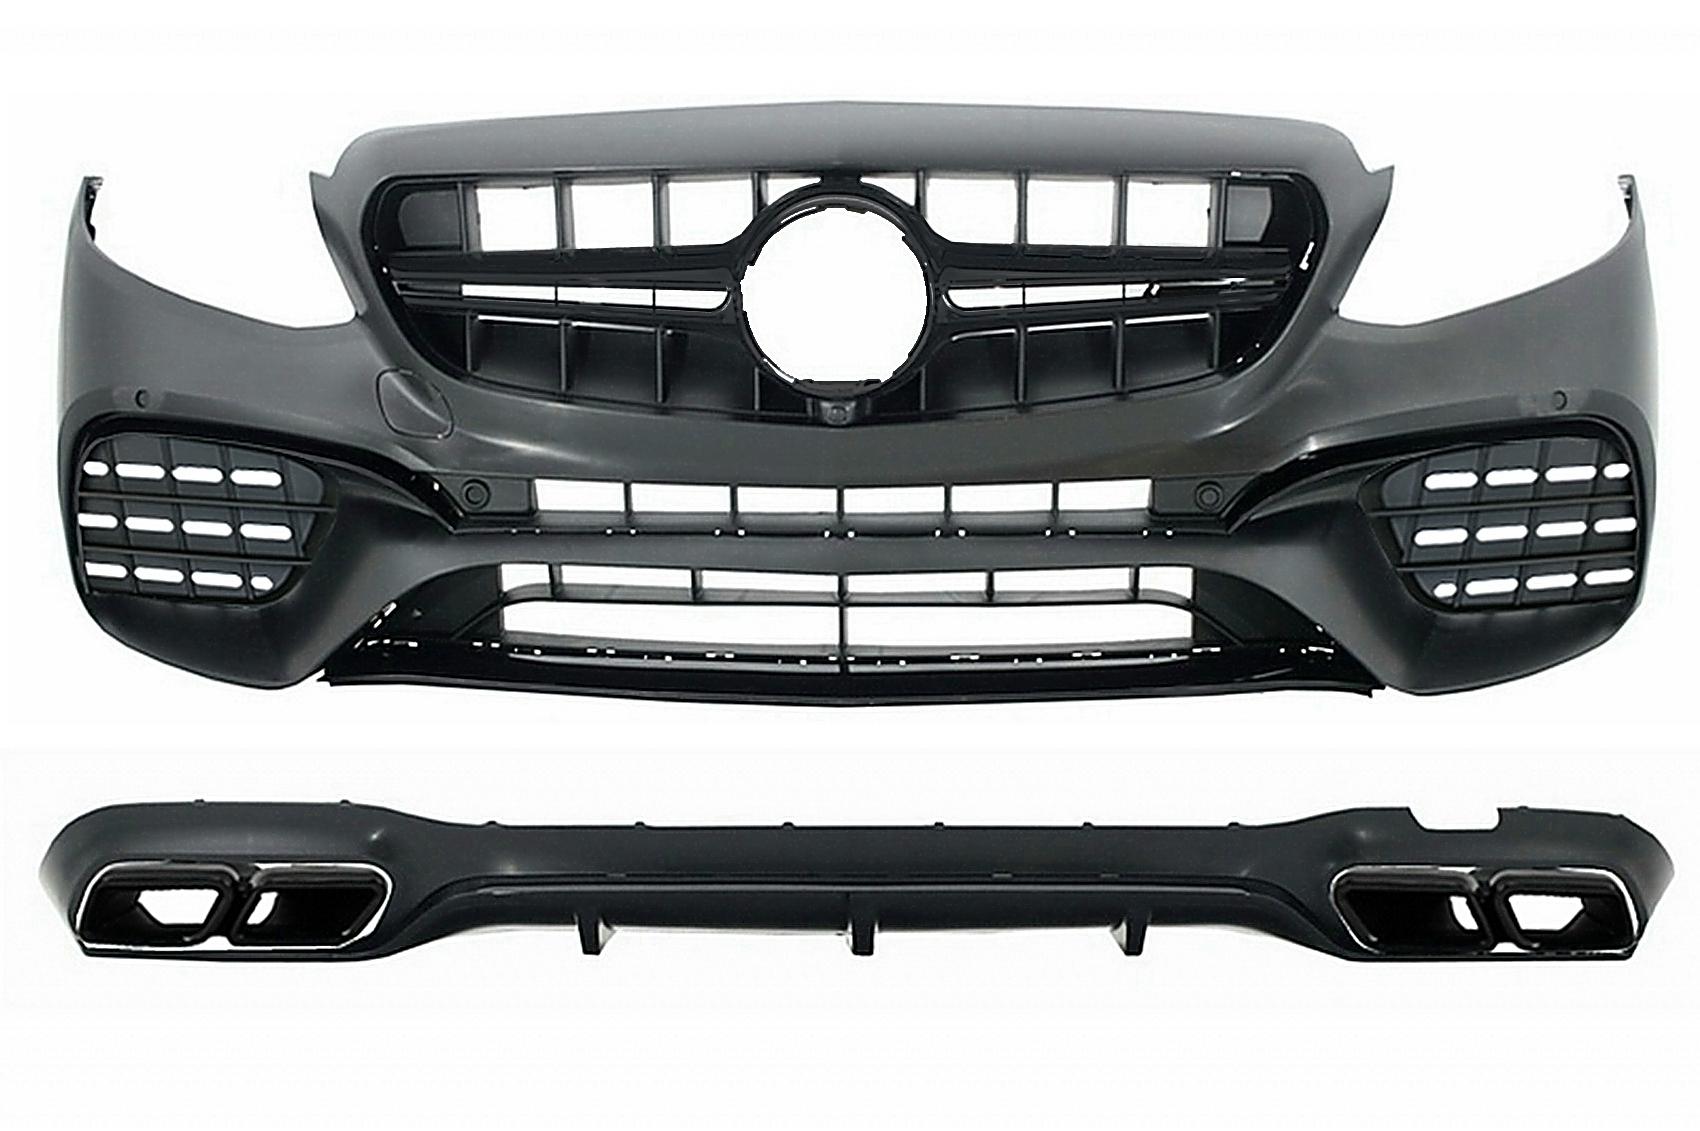 E63 Look Chrom Heckdiffusor Auspuff für Standard Mercedes E Klasse W213 16